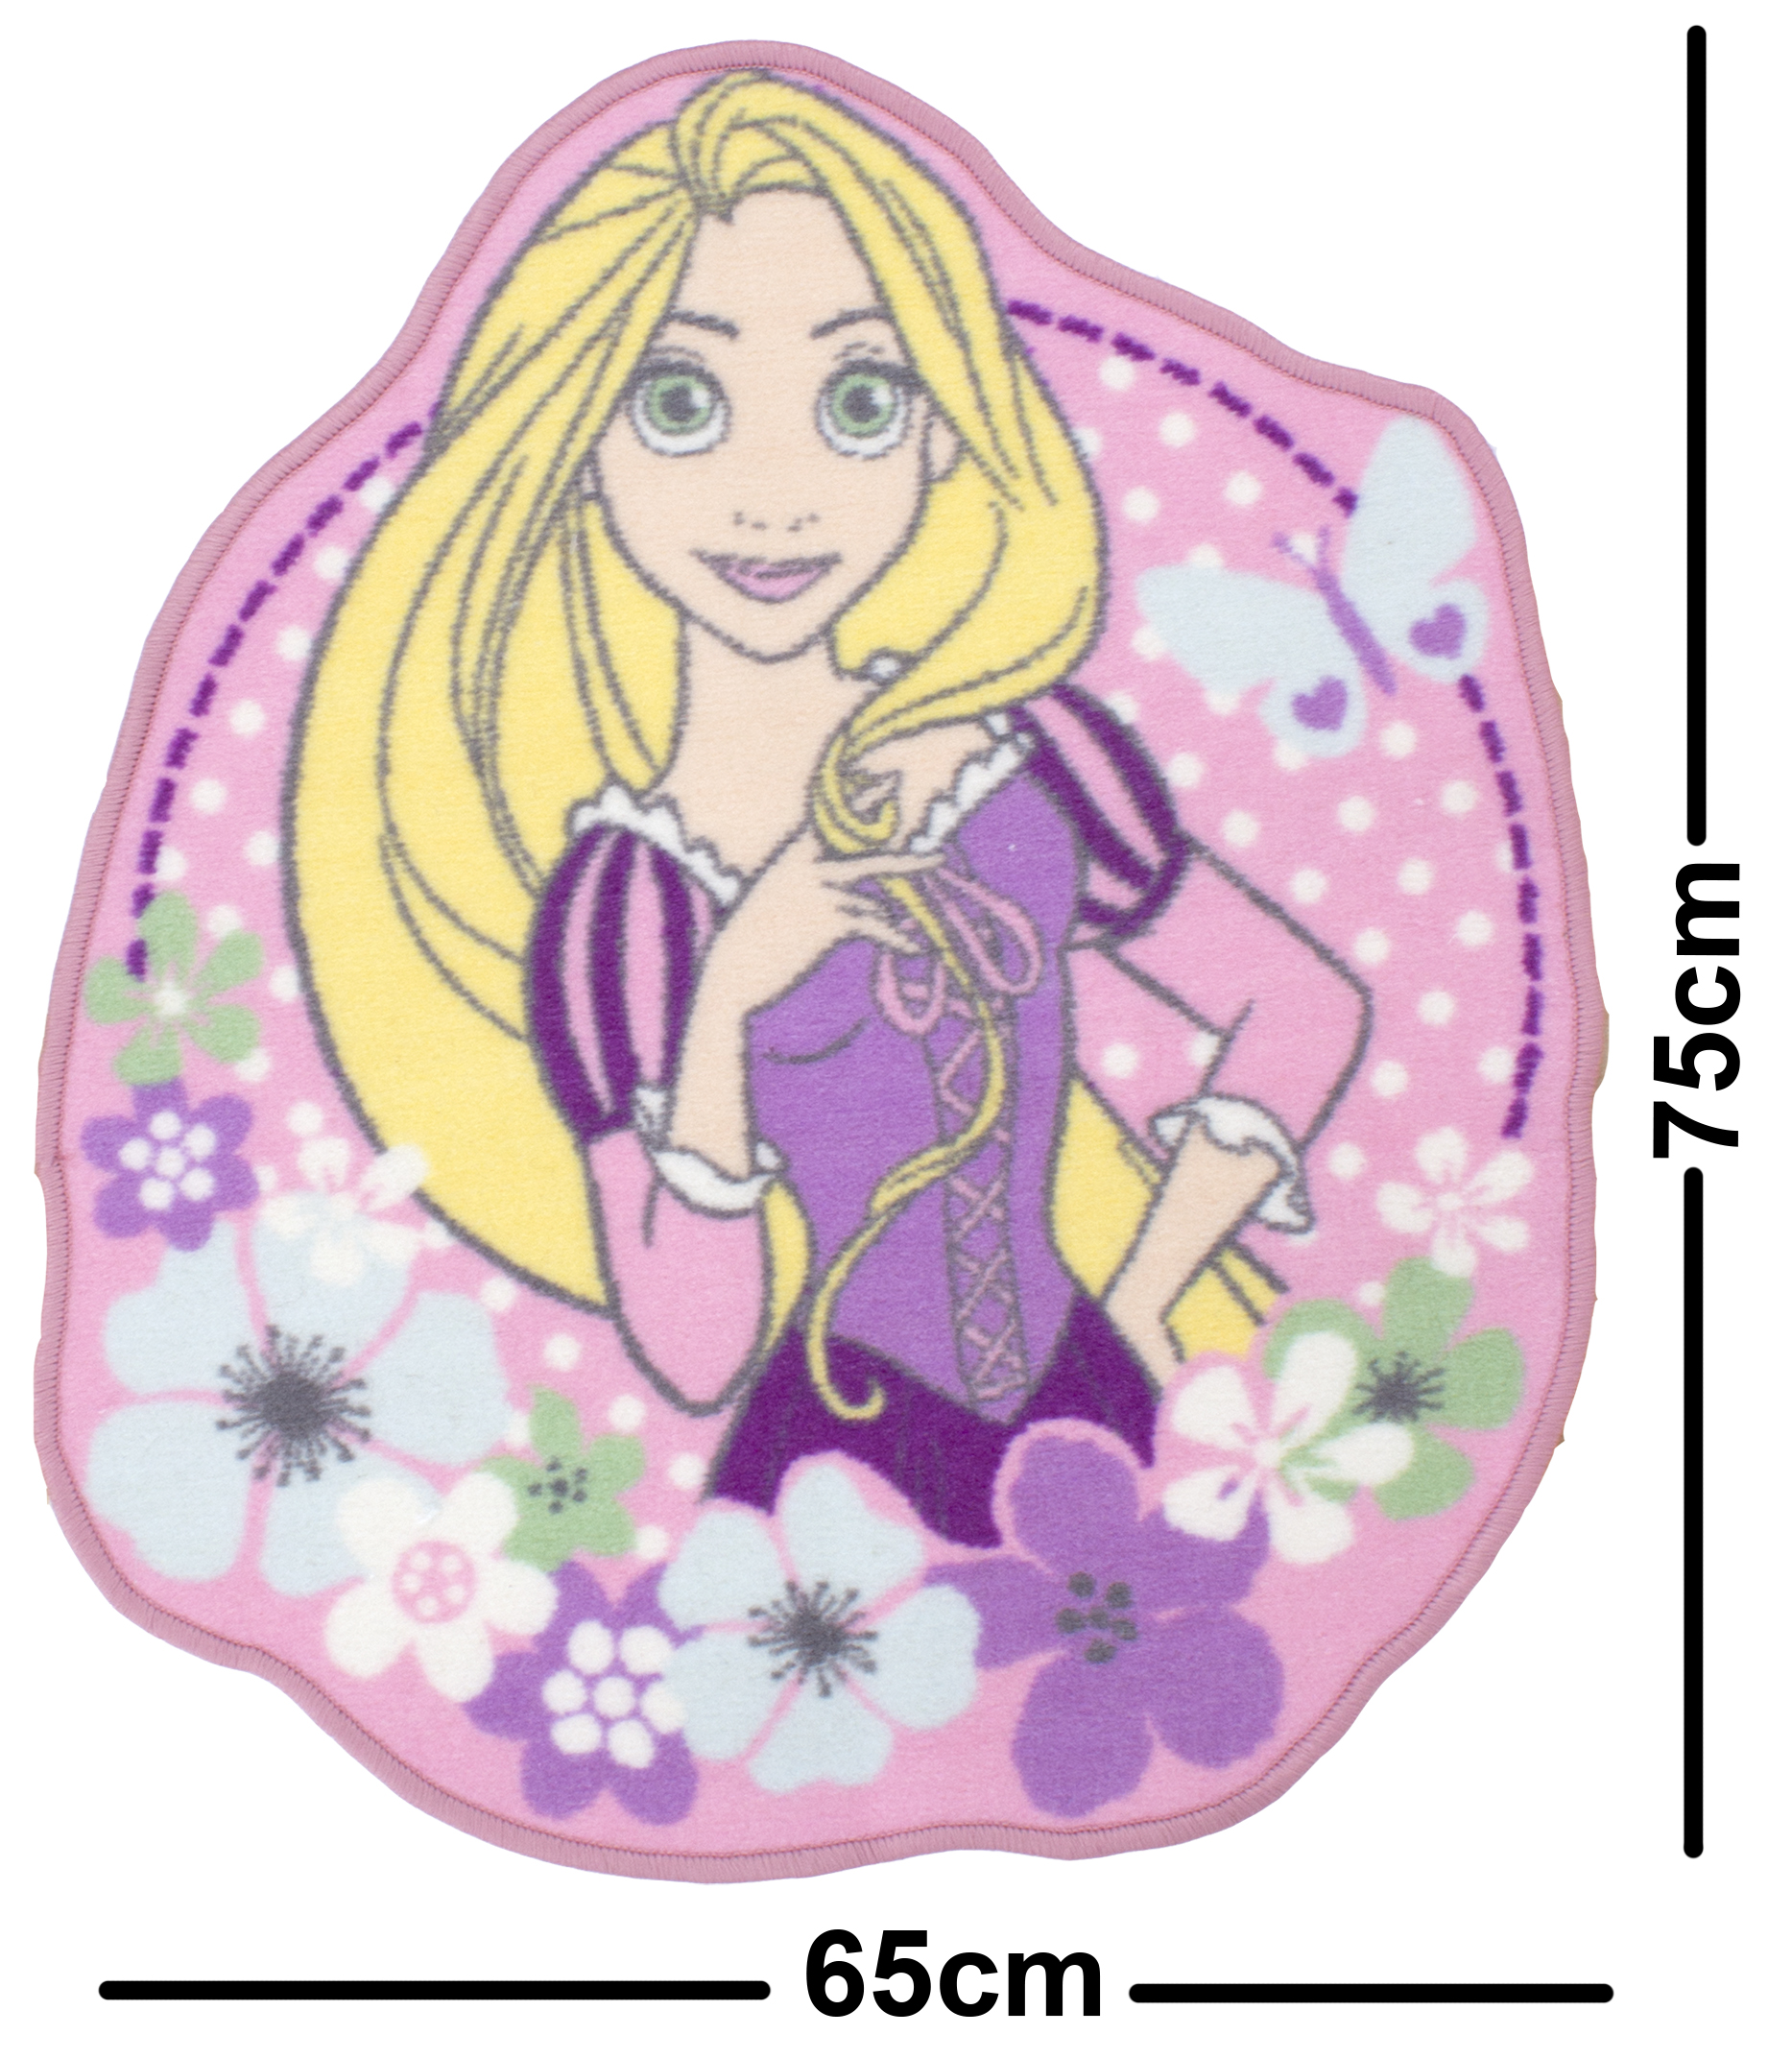 New Disney Princess Pink Bedroom Rug Girls Kids